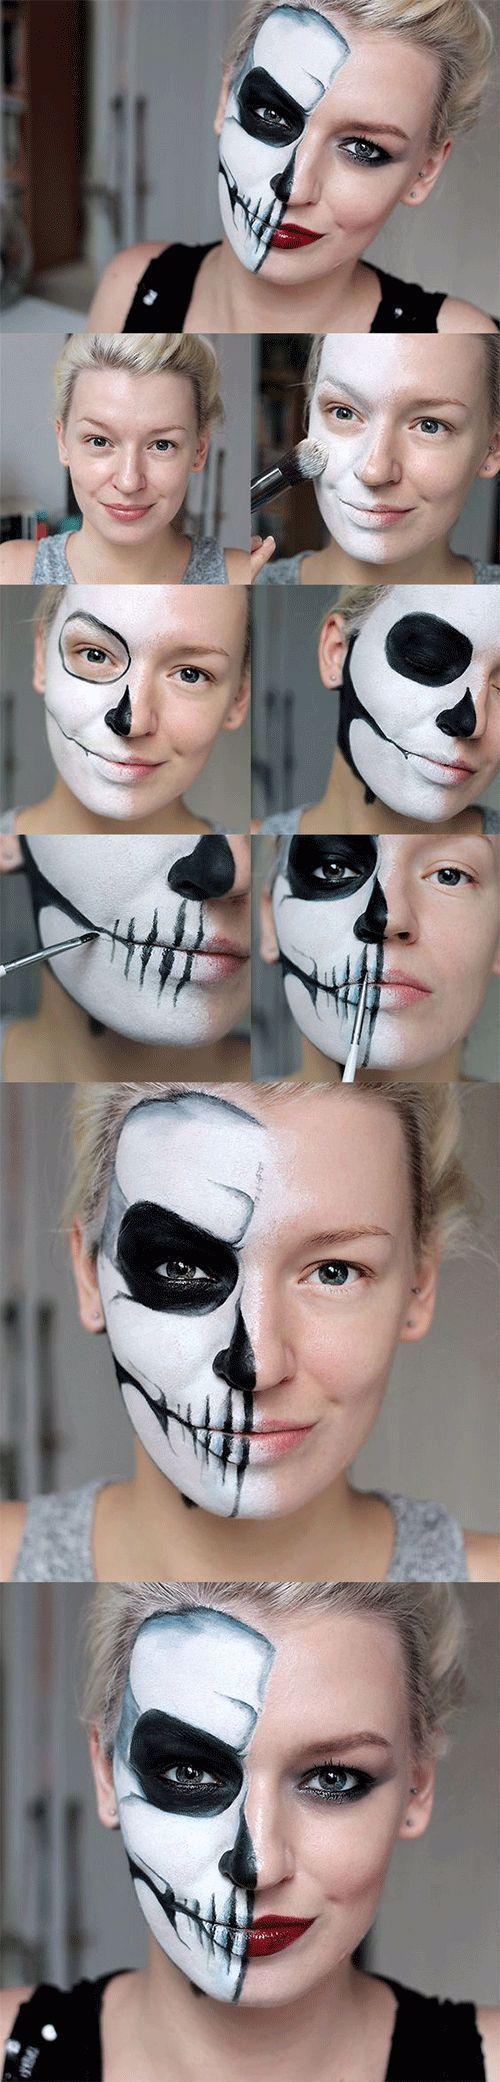 1001 Make up Art peinados fiesta peinadosfiesta en